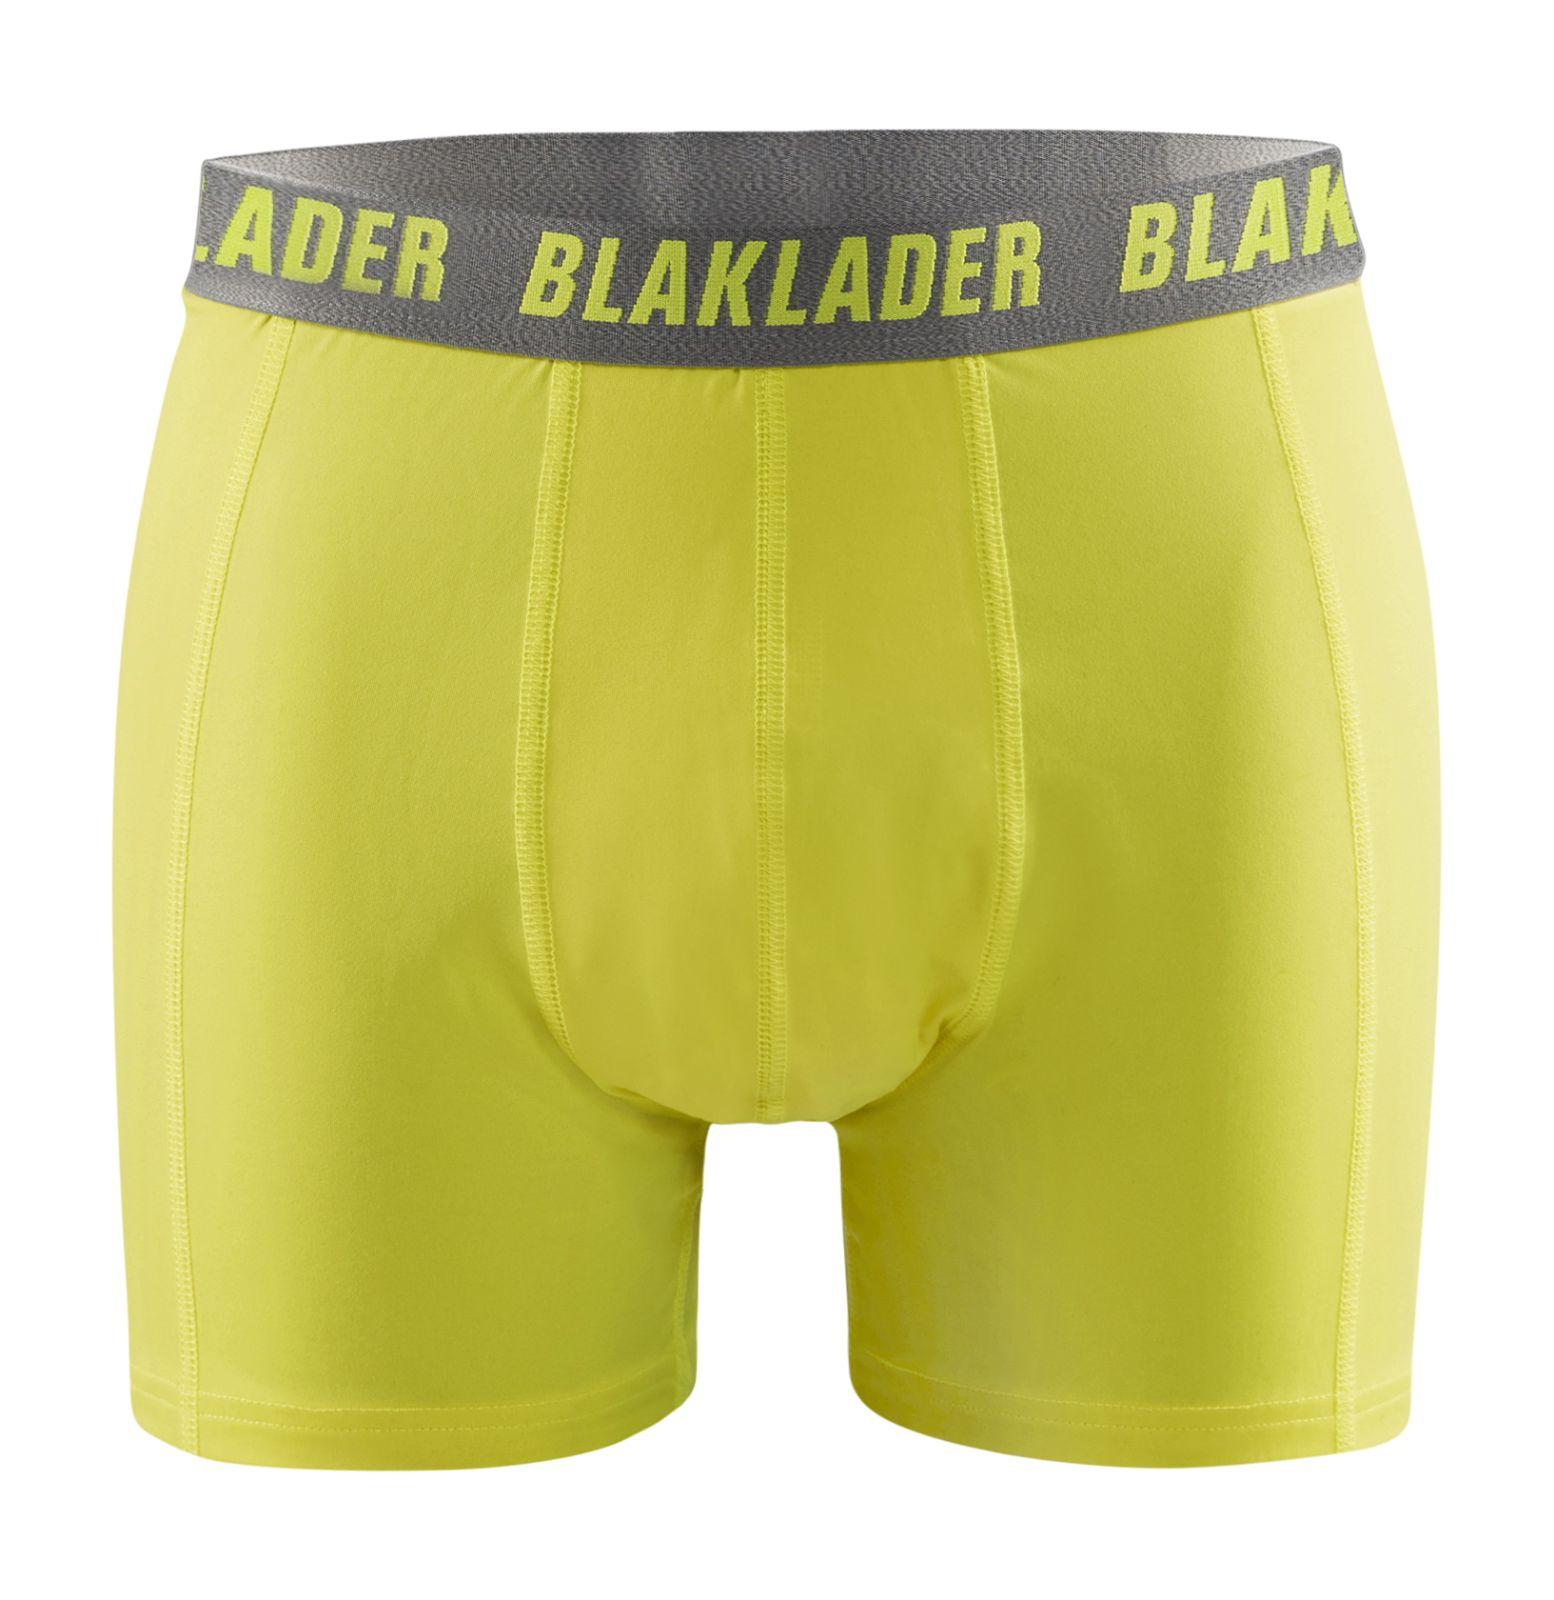 Blaklader Boxershorts 18861079 2-pack fluo geel-grijs(3394)